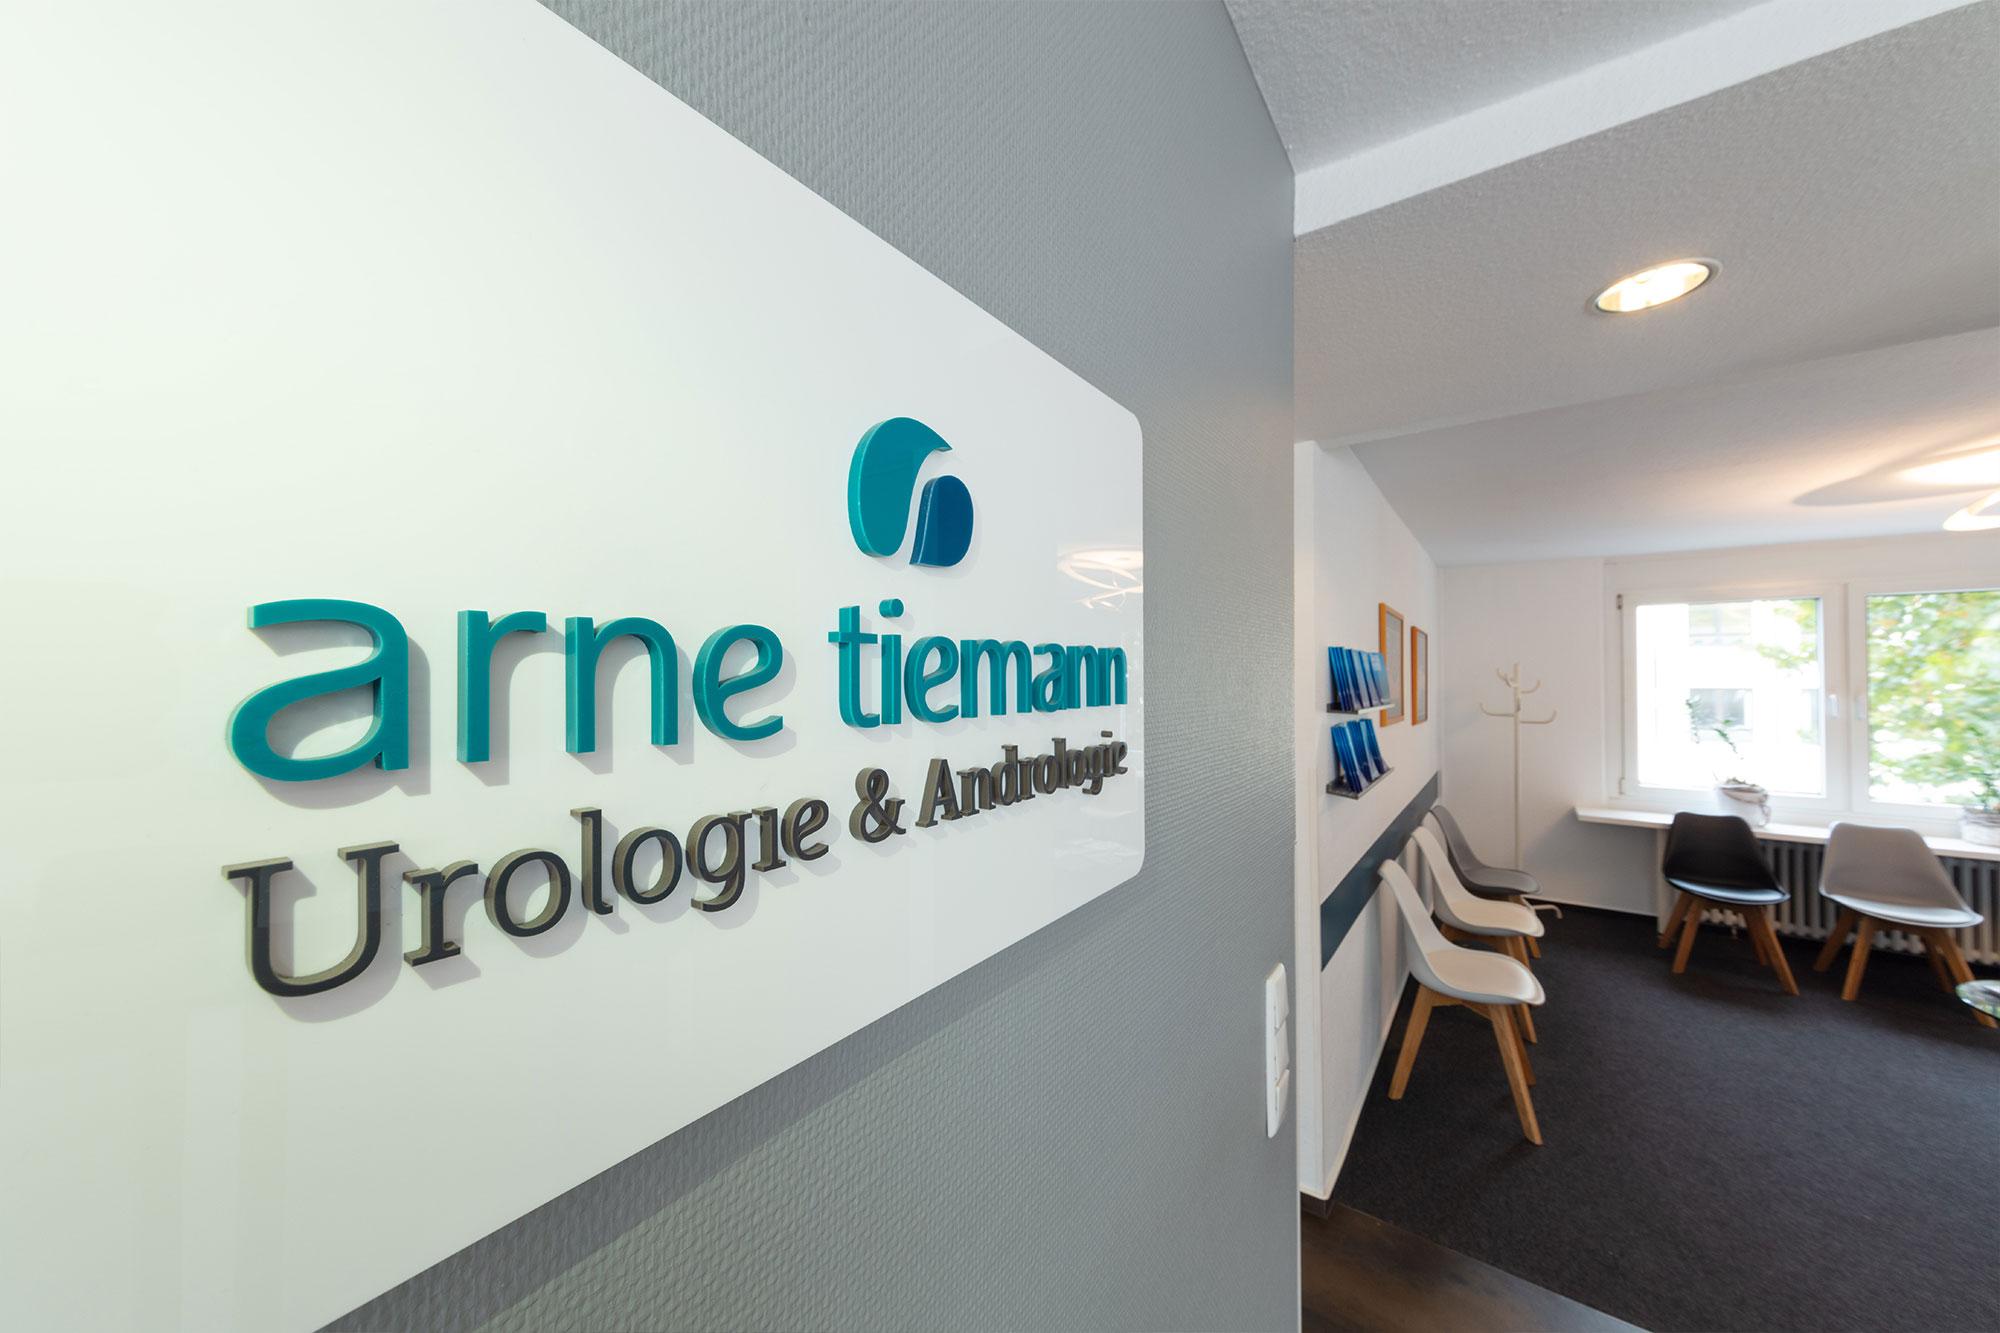 Urologische Praxis Herford | Dr. med. Arne Tiemann